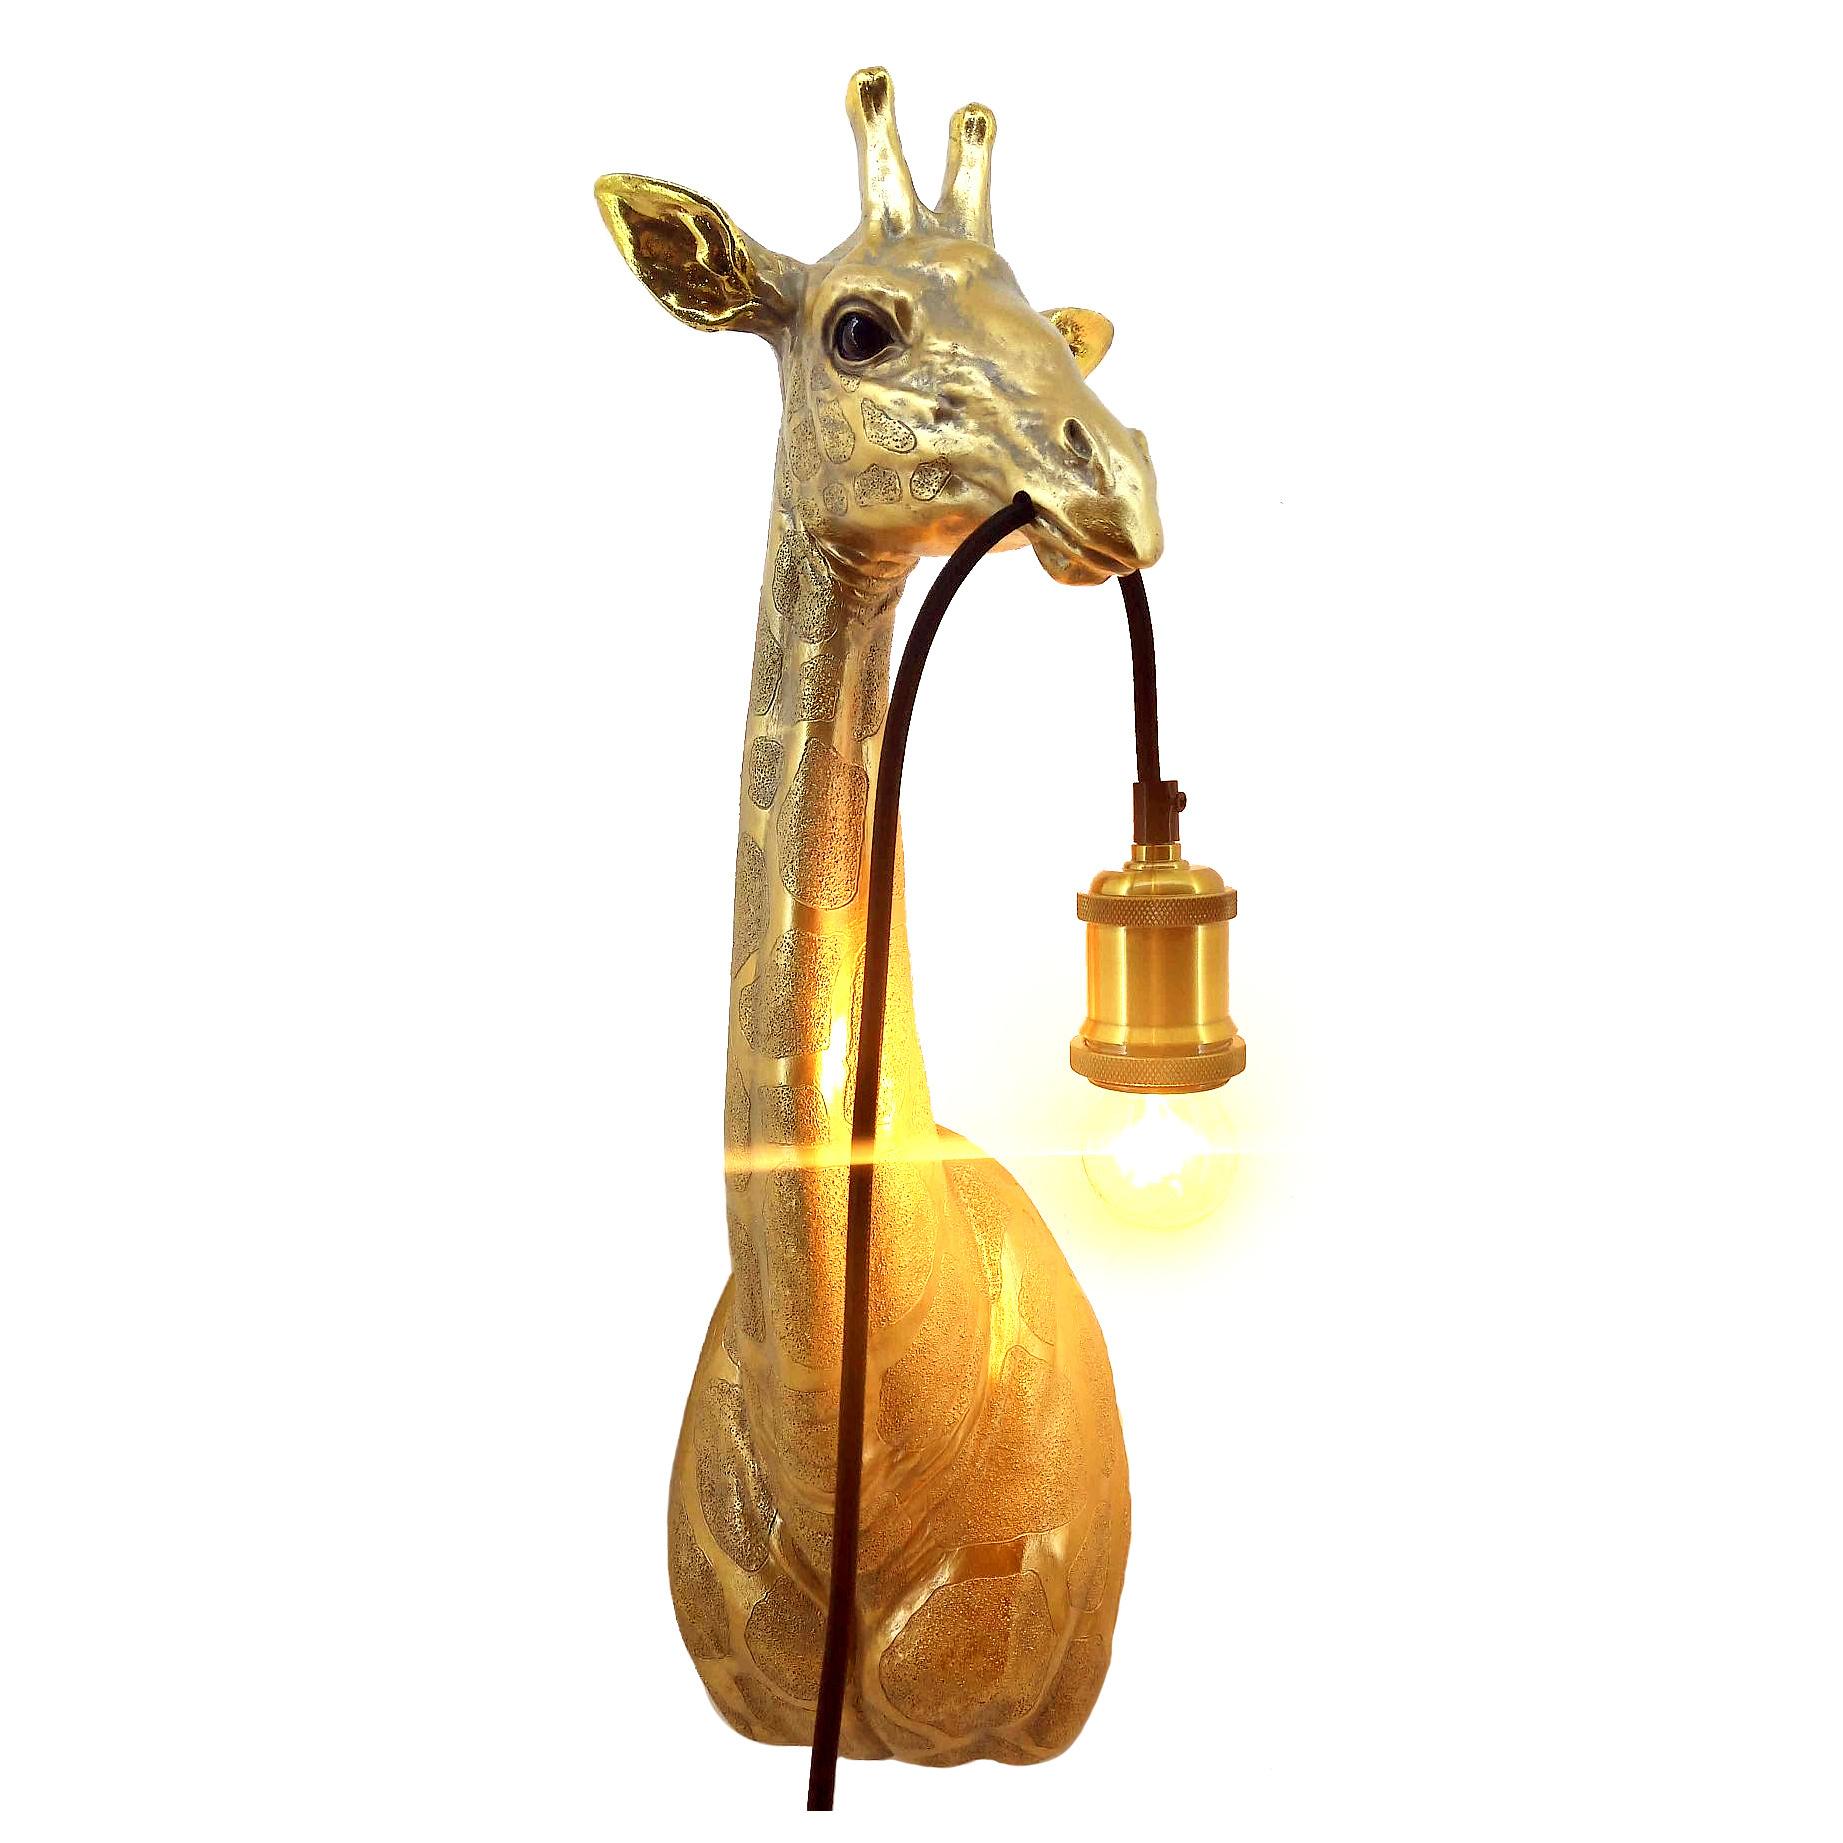 Golden Giraffe Lamp Giraffe Hanging Lamp Gold Livv Lifestyle